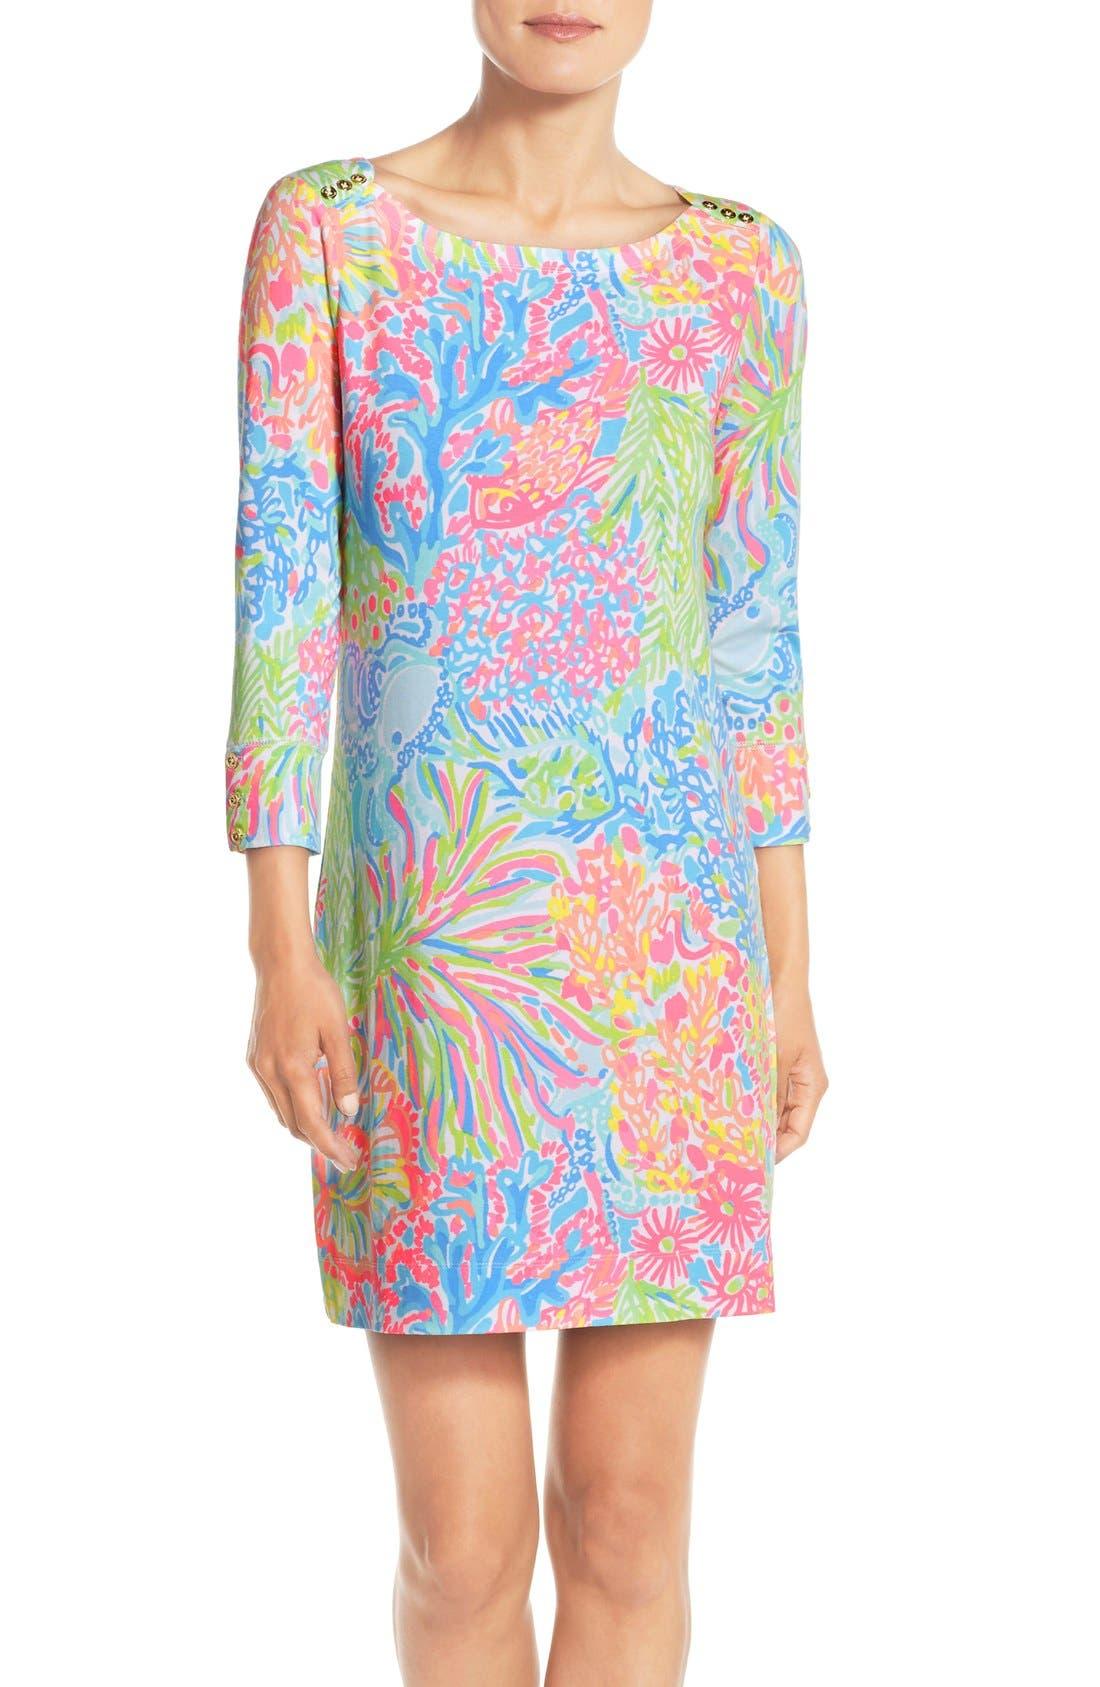 Main Image - Lilly Pulitzer® 'Sophie' Print Jersey Shift Dress (UPF 50)